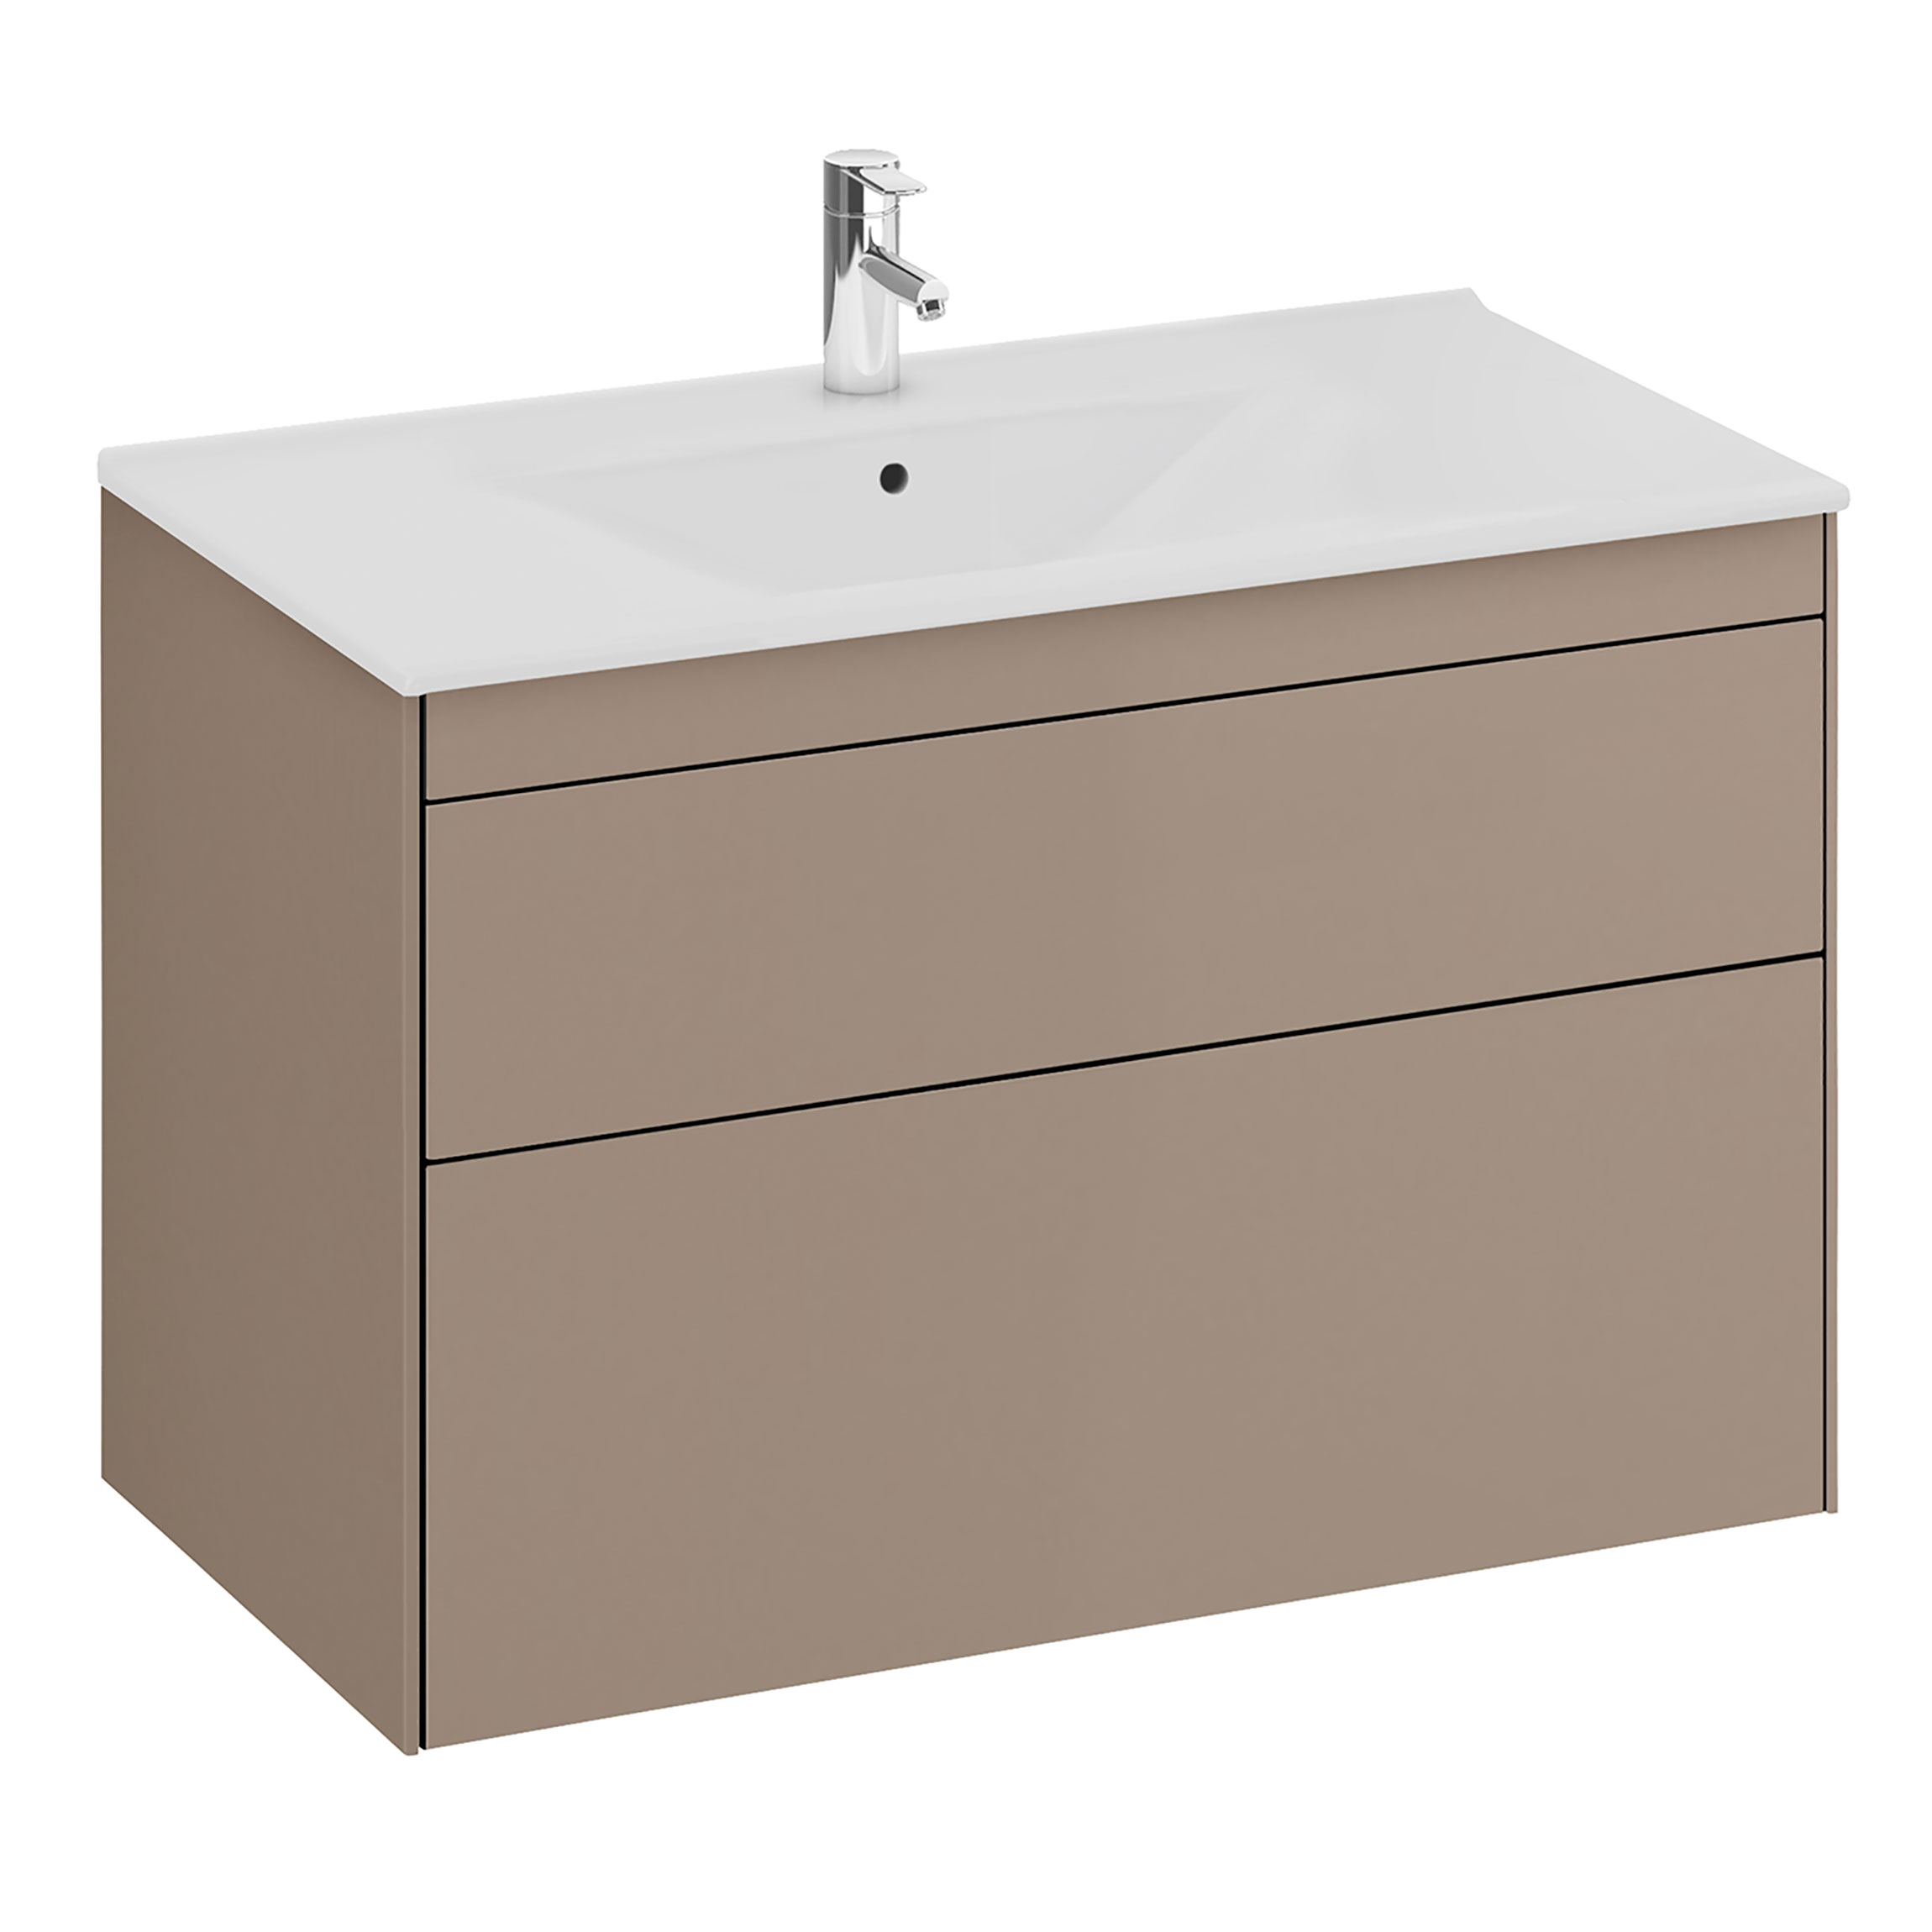 Tvättställsskåp Ifö Sense 90